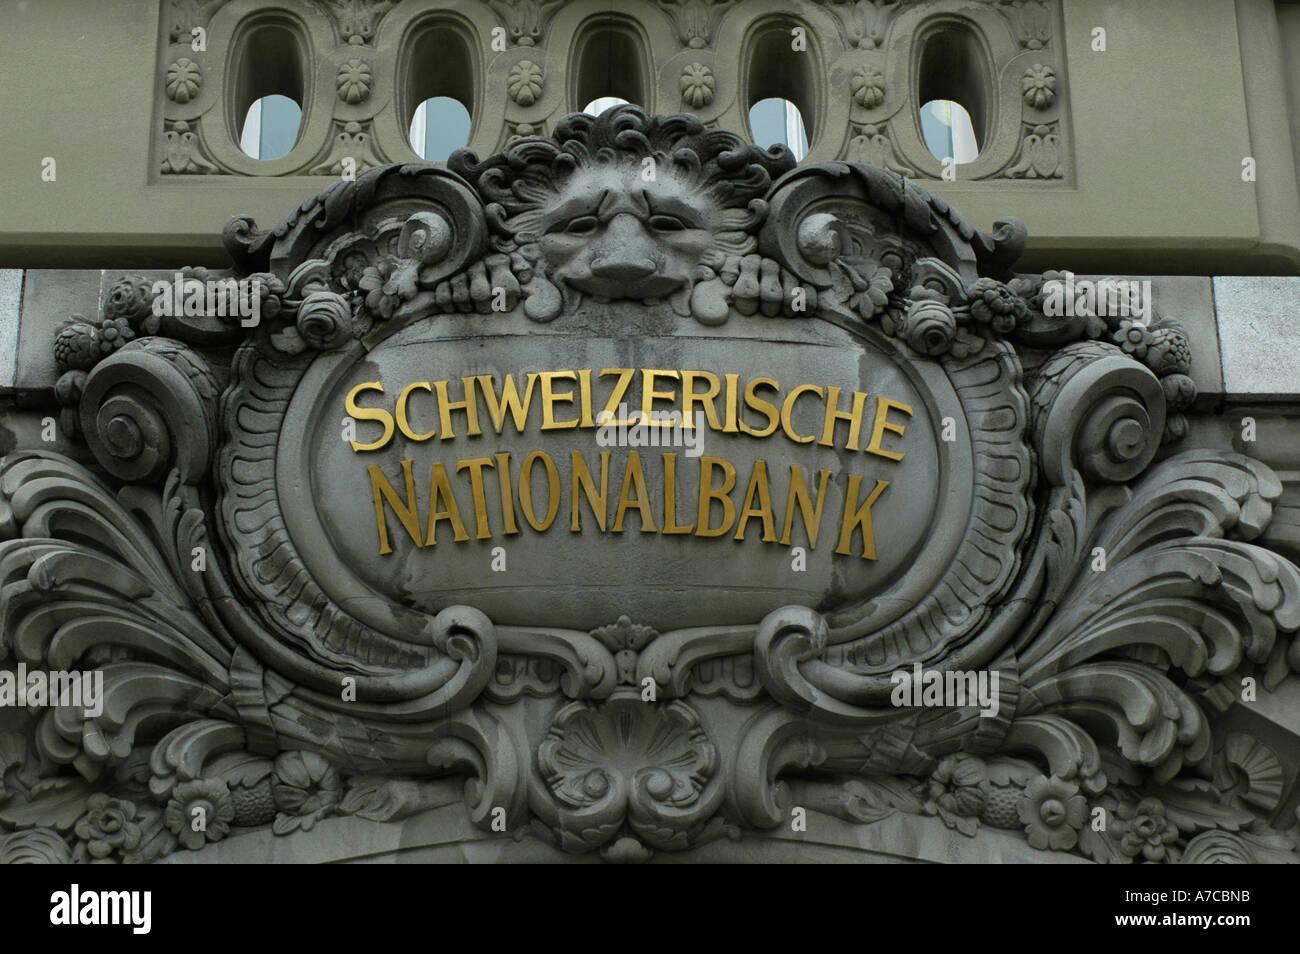 swiss national bank in bern, switzerland.  (c) by uli nusko, ch-3012 bern. - Stock Image